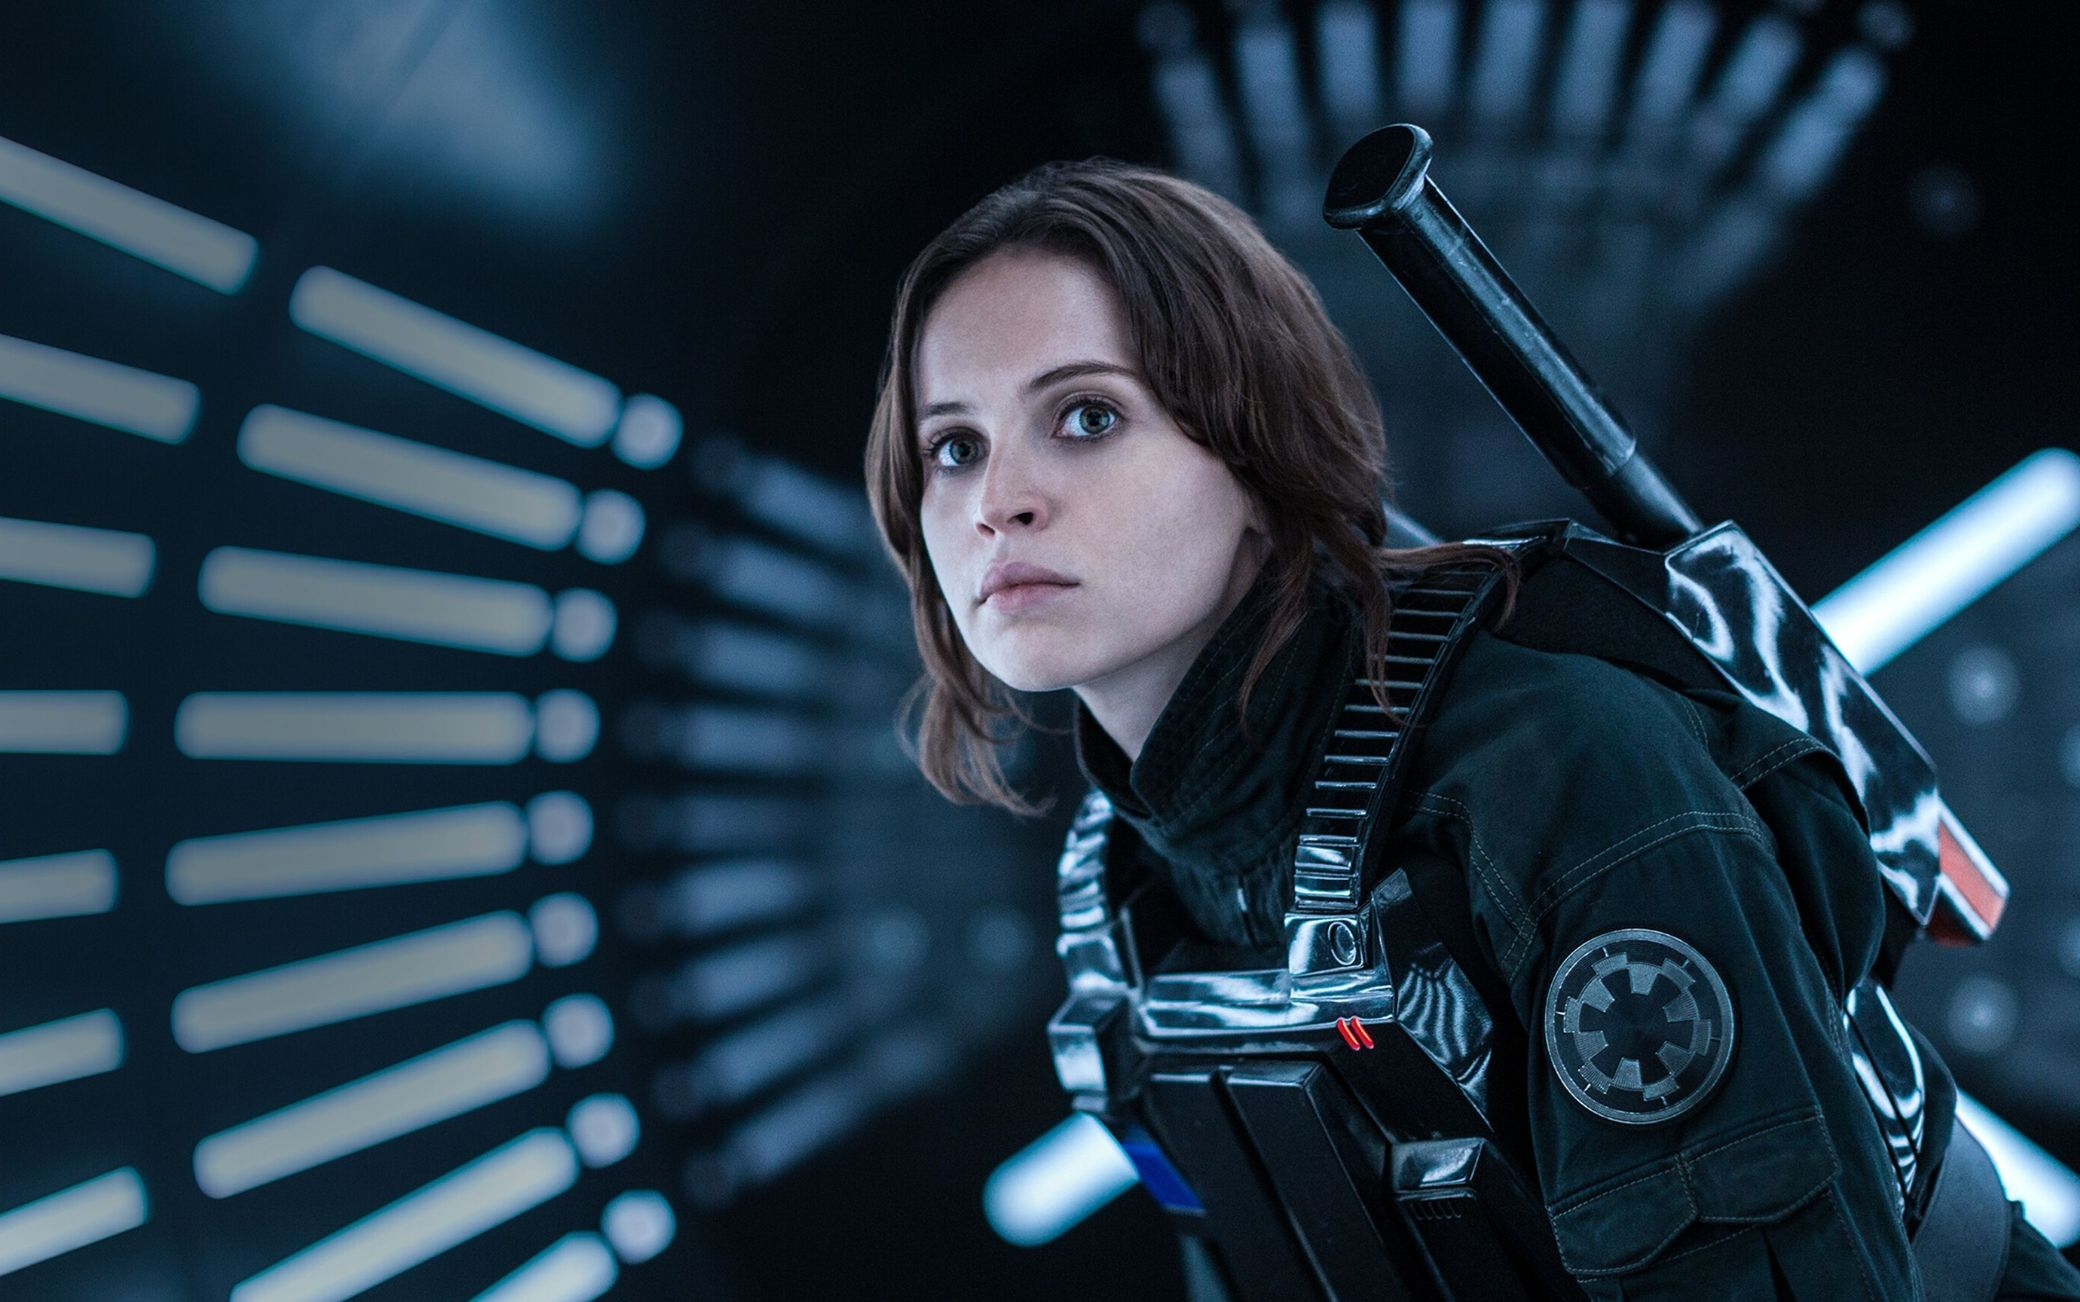 8 curiosità su Rogue One: A Star Wars Story